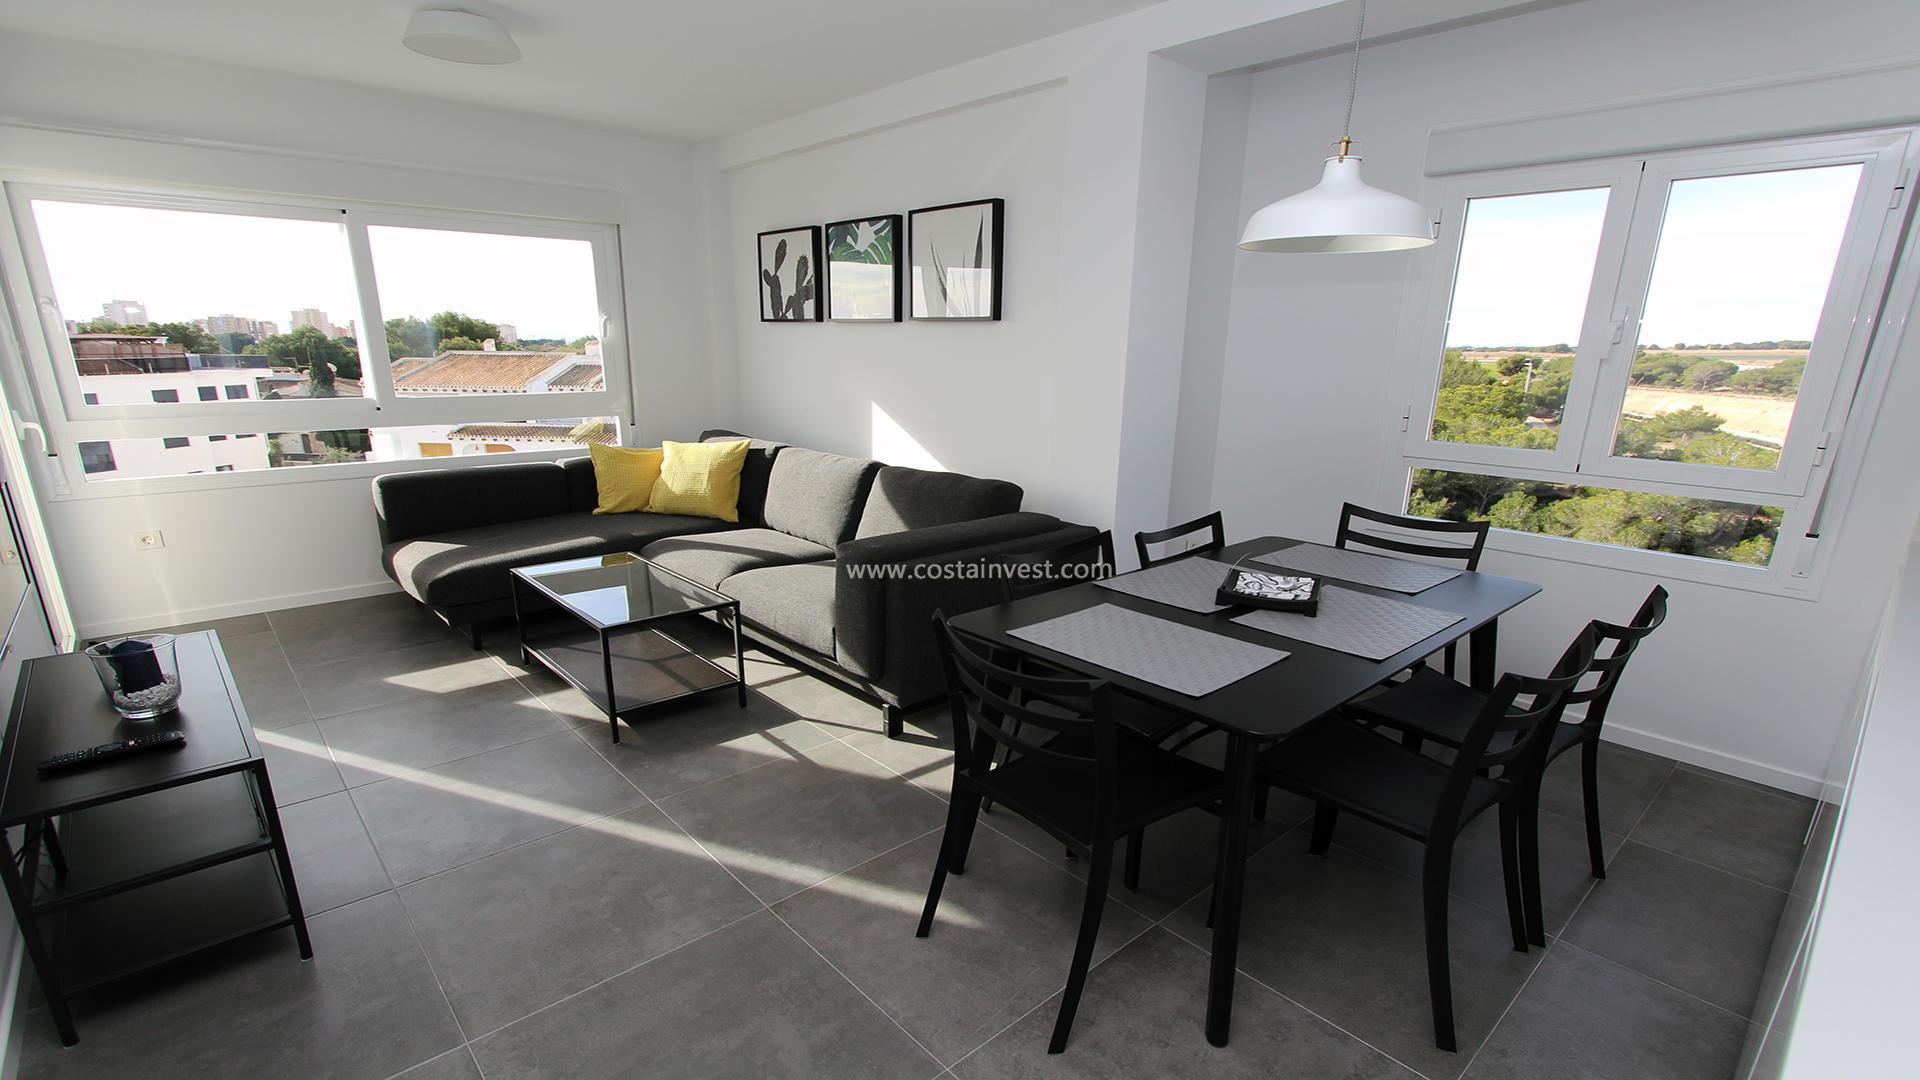 Apartament -                                       Orihuela Costa -                                       3 sypialnie -                                       5 osoby